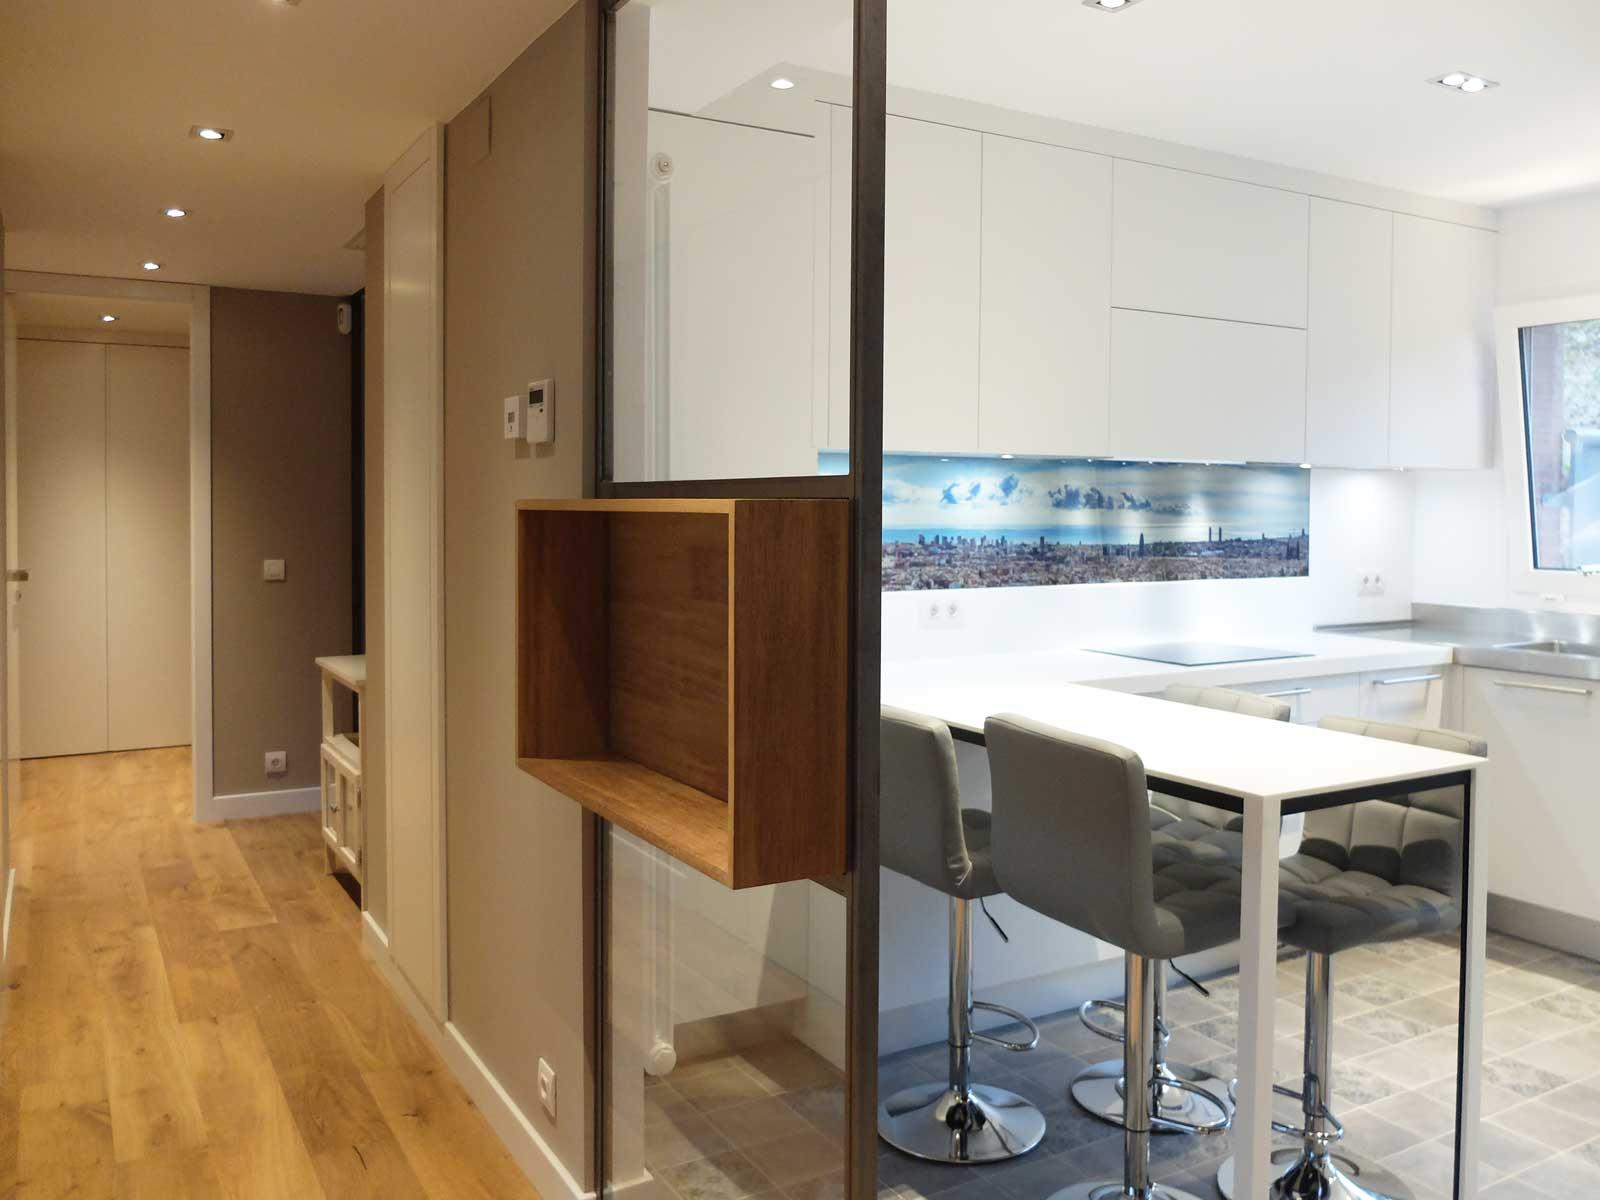 Fantástico Mueble De Cocina Pintores Barrie Componente - Ideas de ...